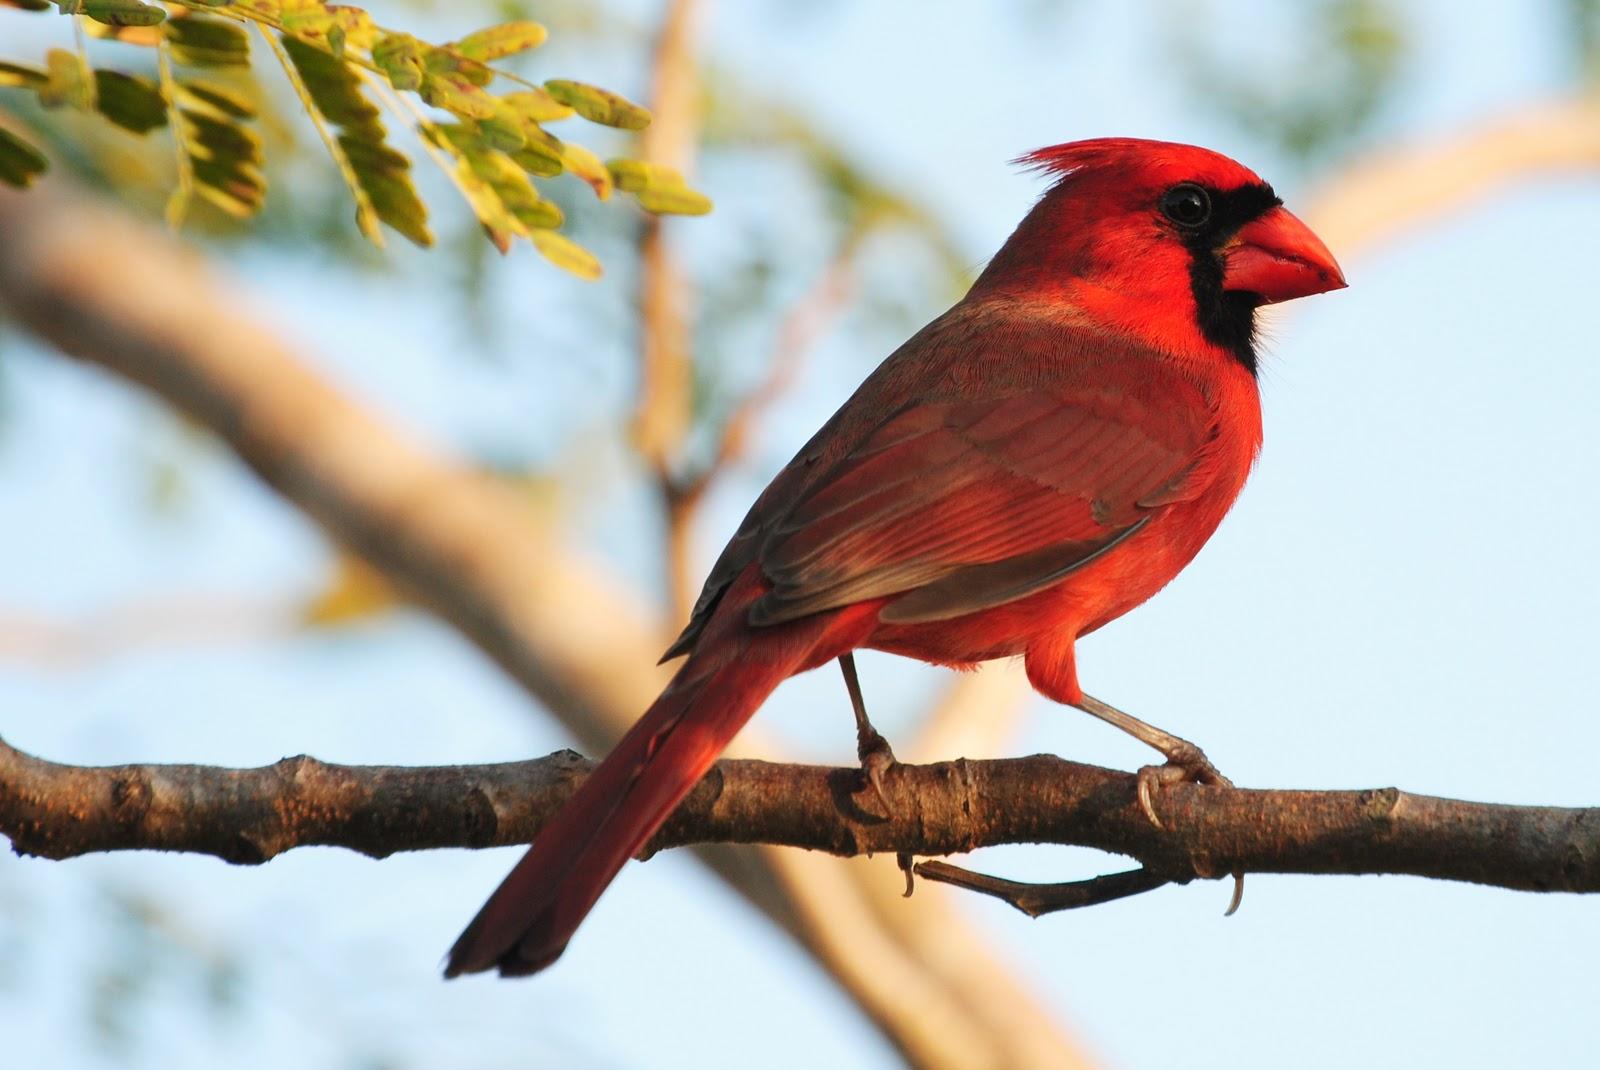 A Beautiful Red Bird On A Branch Bird Conservation